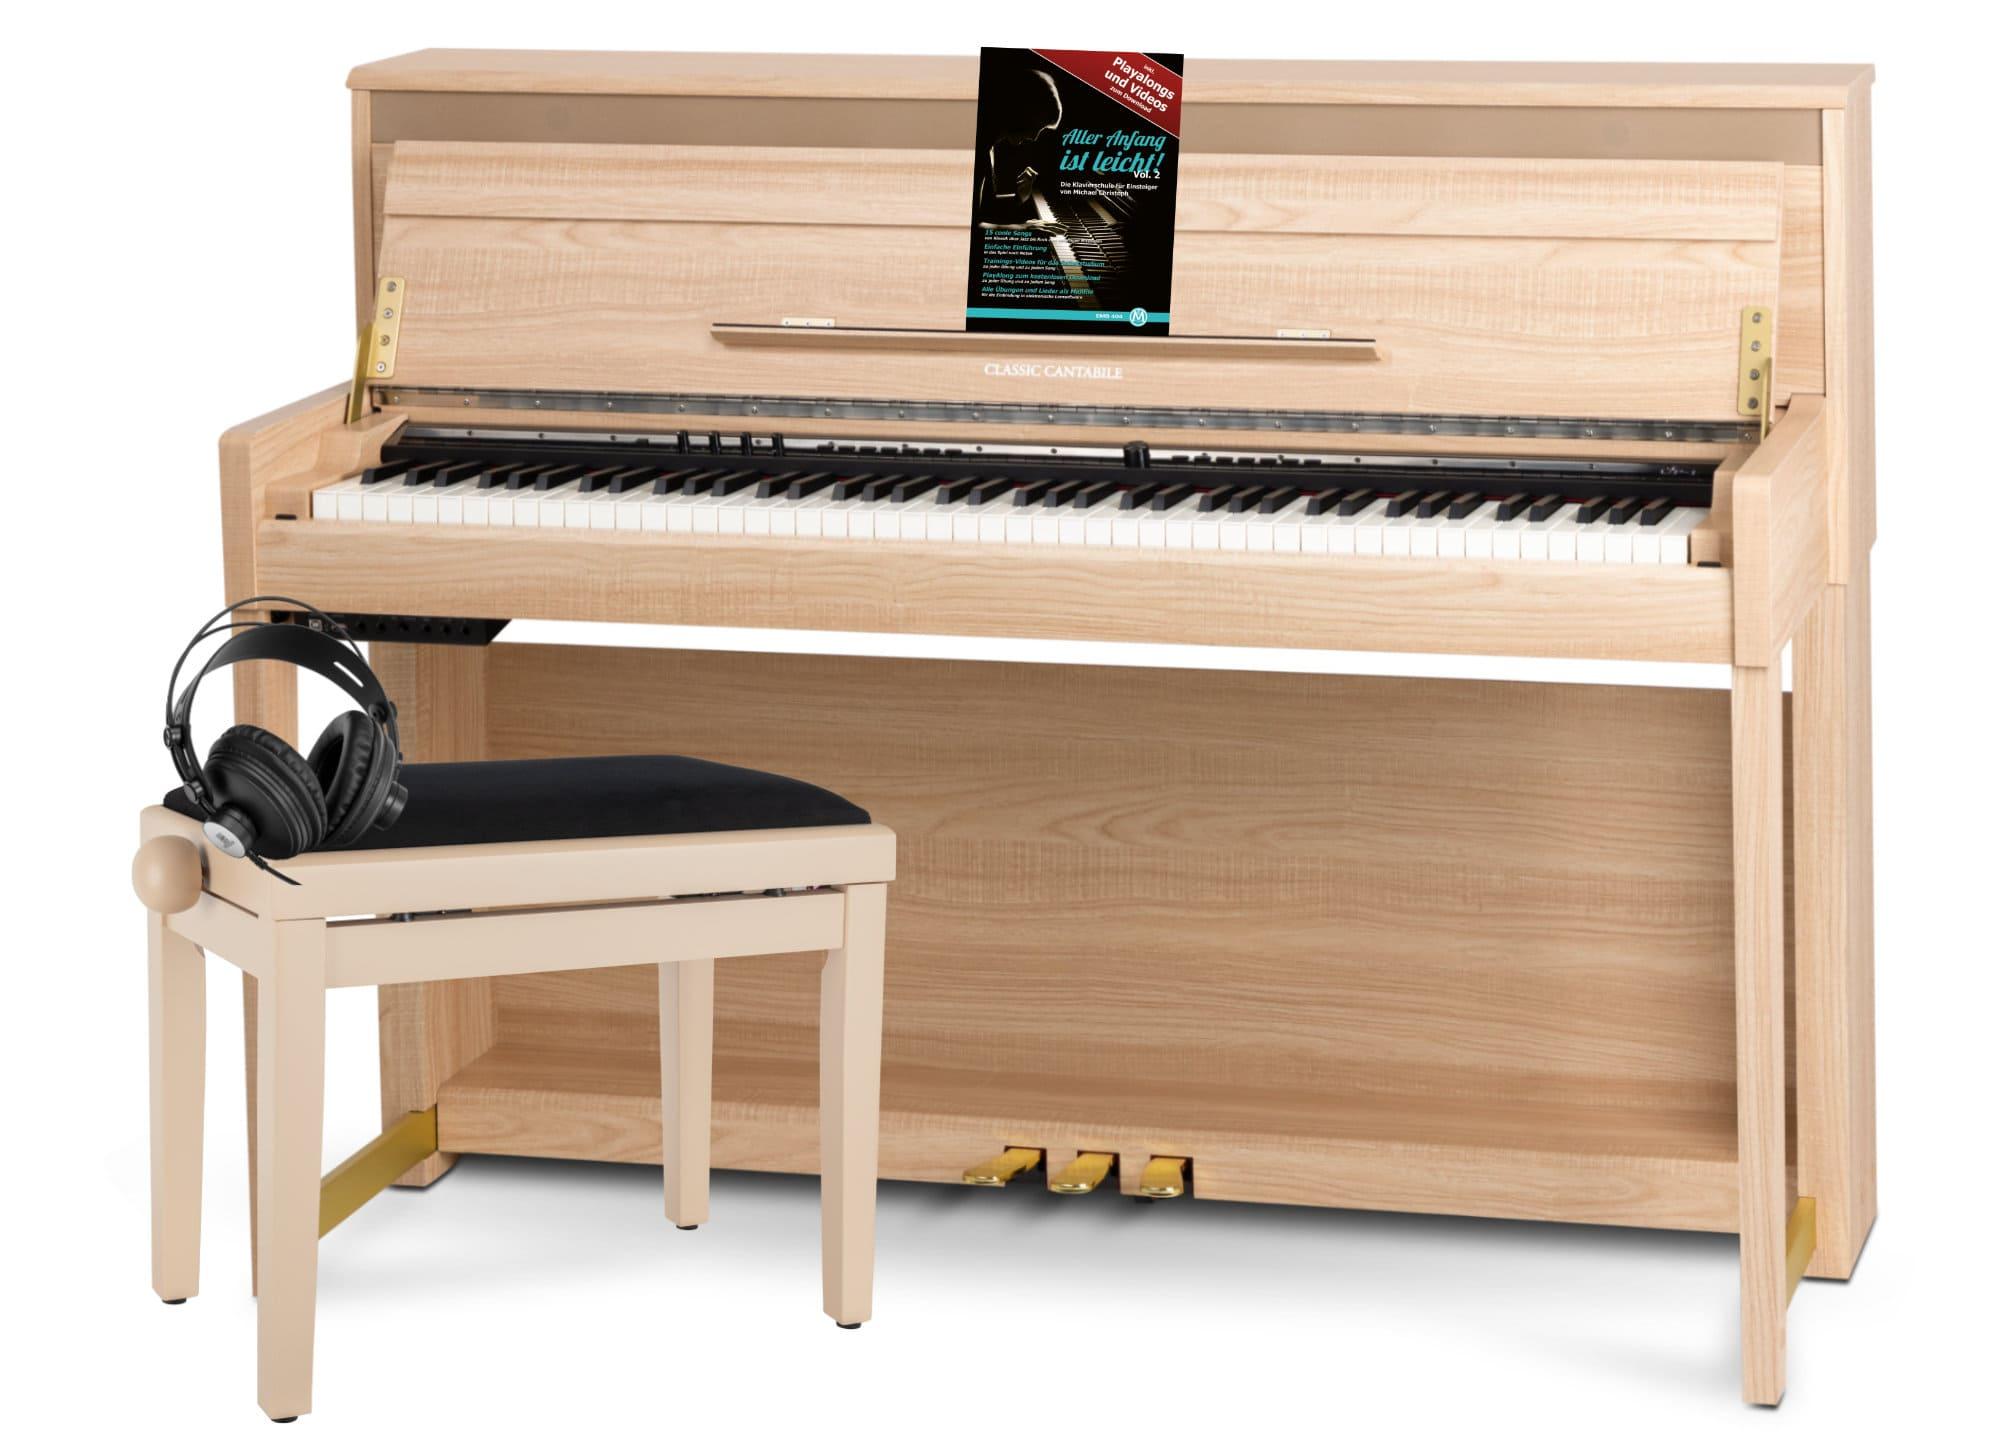 Digitalpianos - Classic Cantabile UP 1 LA E Piano Eiche hell Deluxe Set - Onlineshop Musikhaus Kirstein